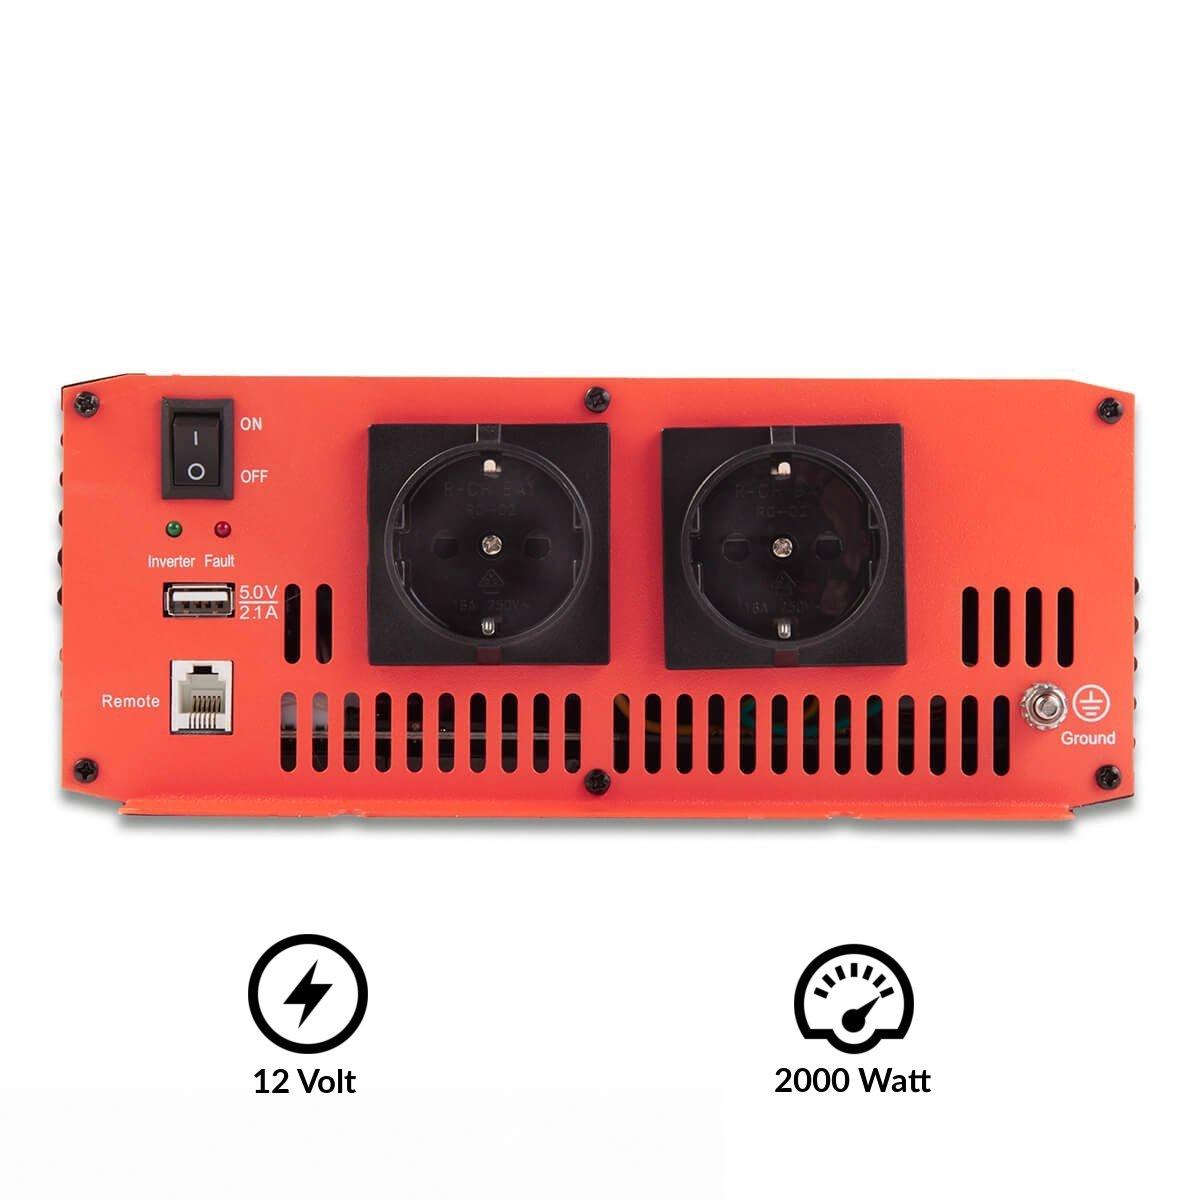 ECTIVE Serie SI caz | Inversor de onda sinusoidal 12V a 230V | 2000W | Los transformadores de tensión, transformadores de corriente, convertidor de energía, ...